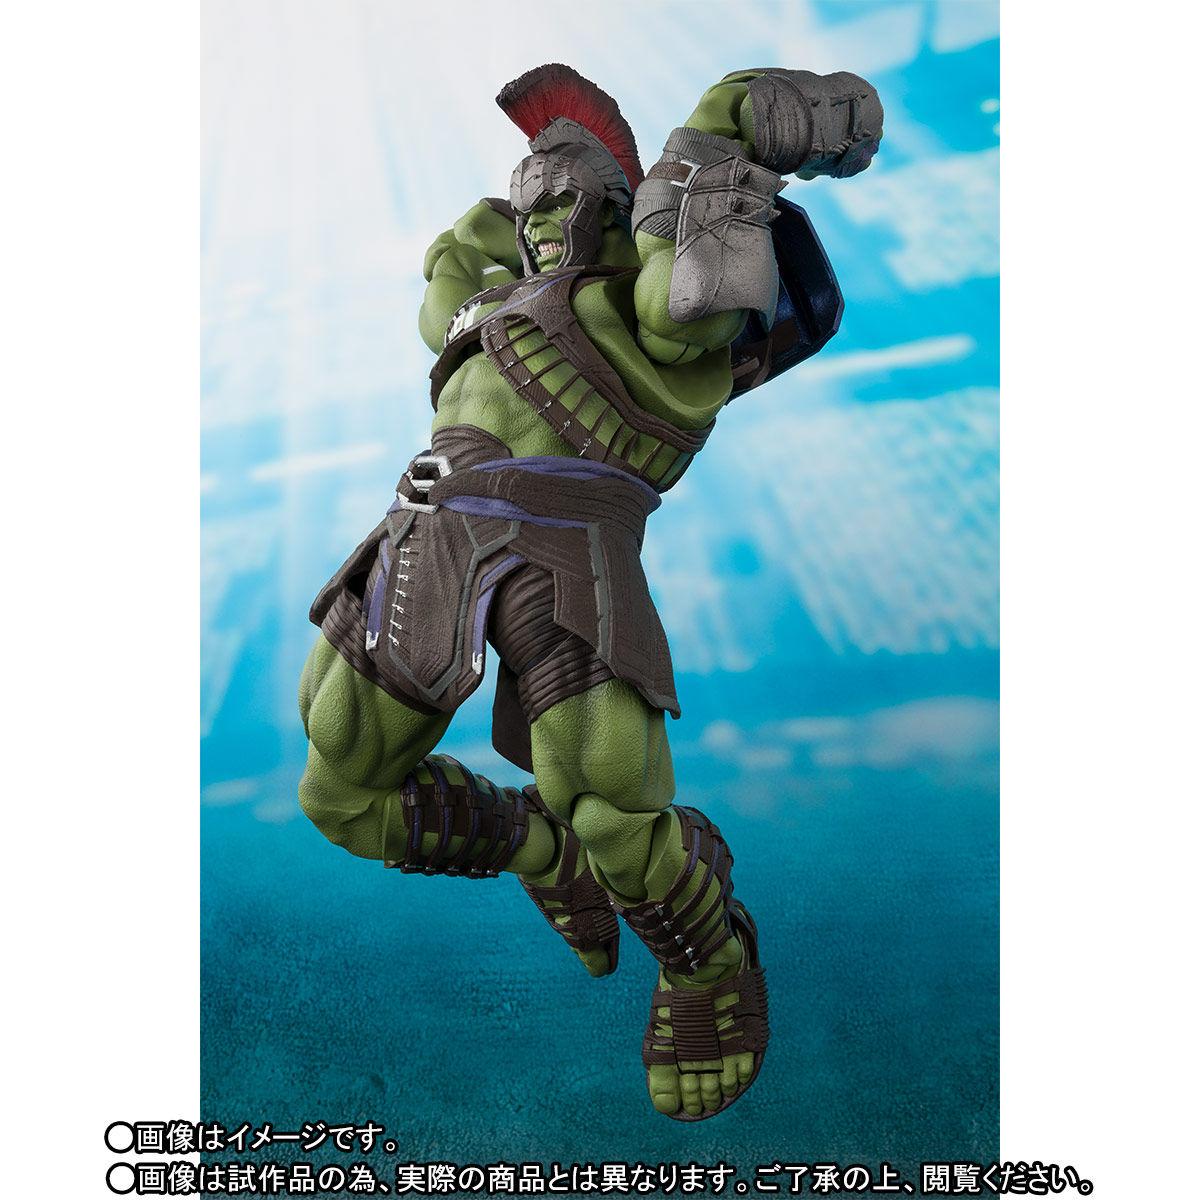 SH-Figuarts-Gladiator-Hulk-008